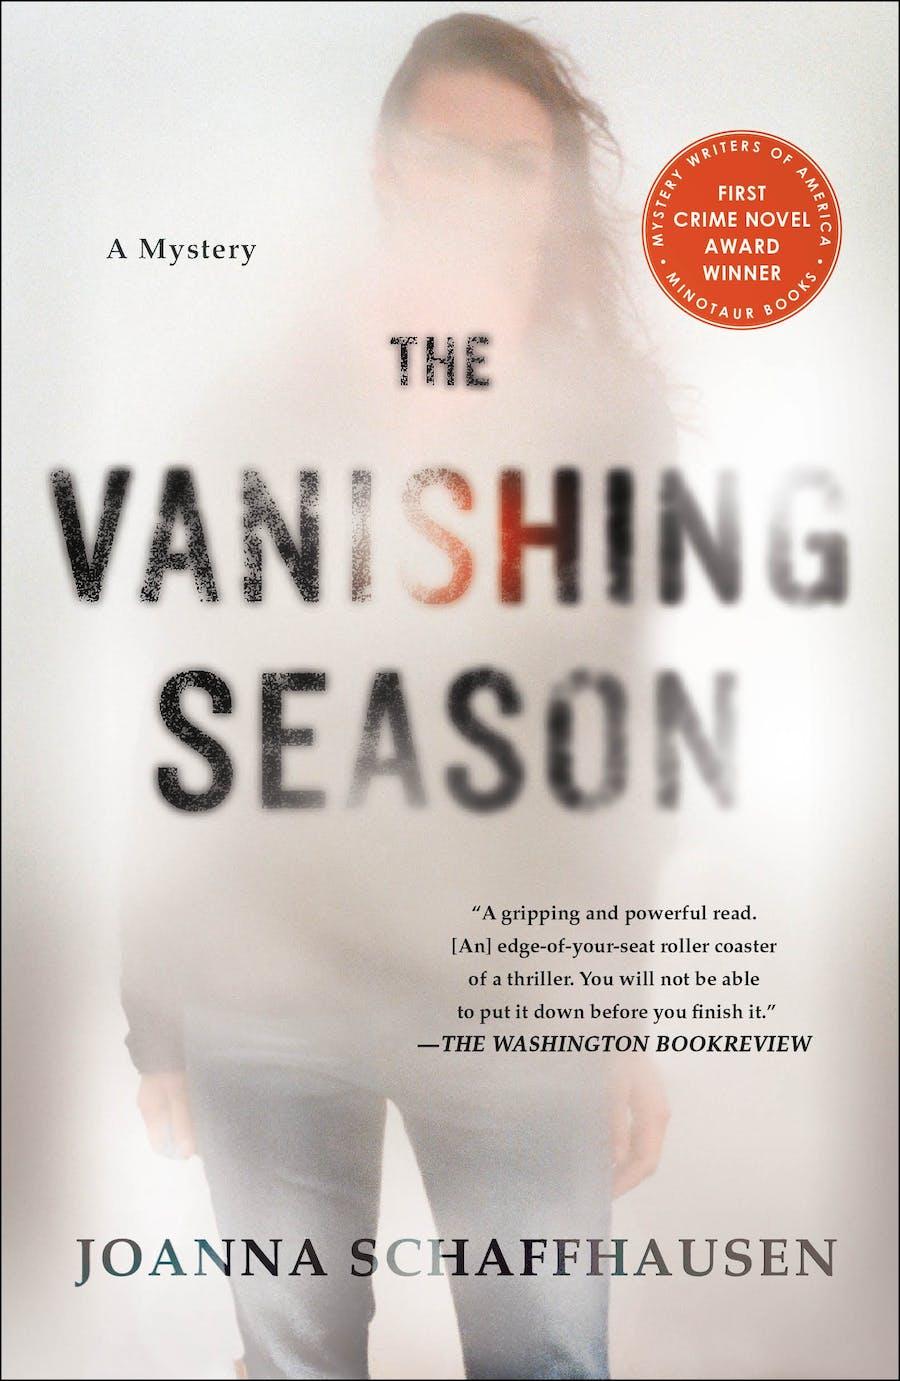 The Vanishing Season by Joanna Schaffhausen